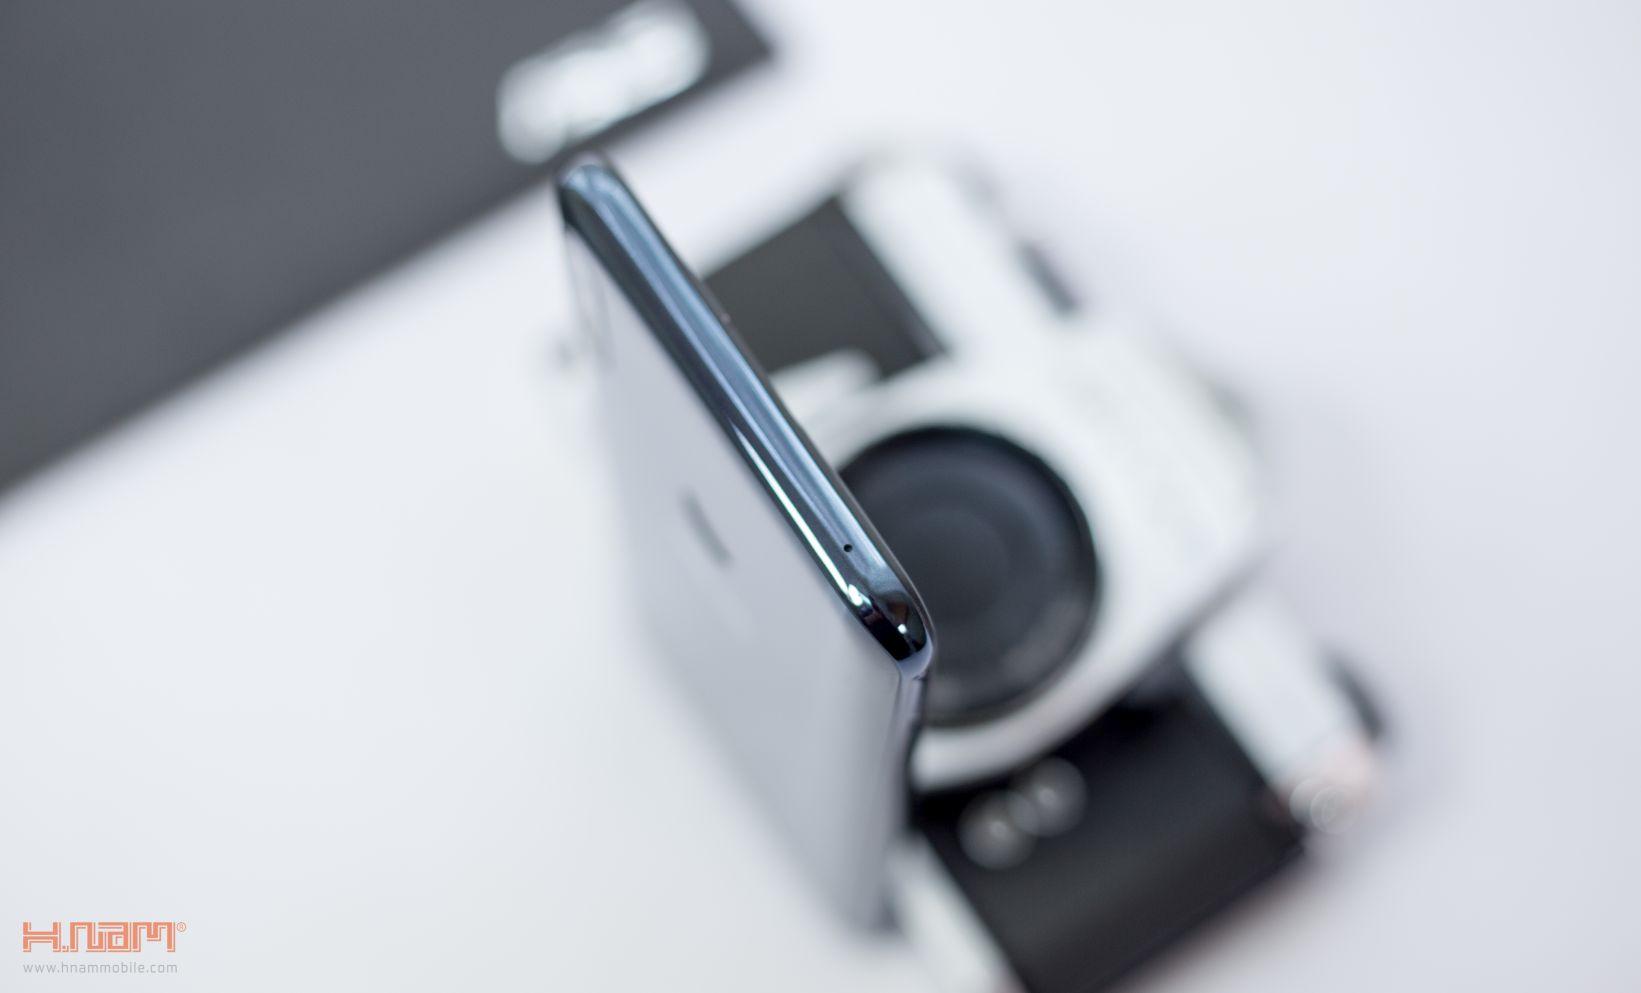 Trên tay Zenfone Max Pro M2: Snapdragon 660, pin 5000mAh, 5.29 triệu hình 6